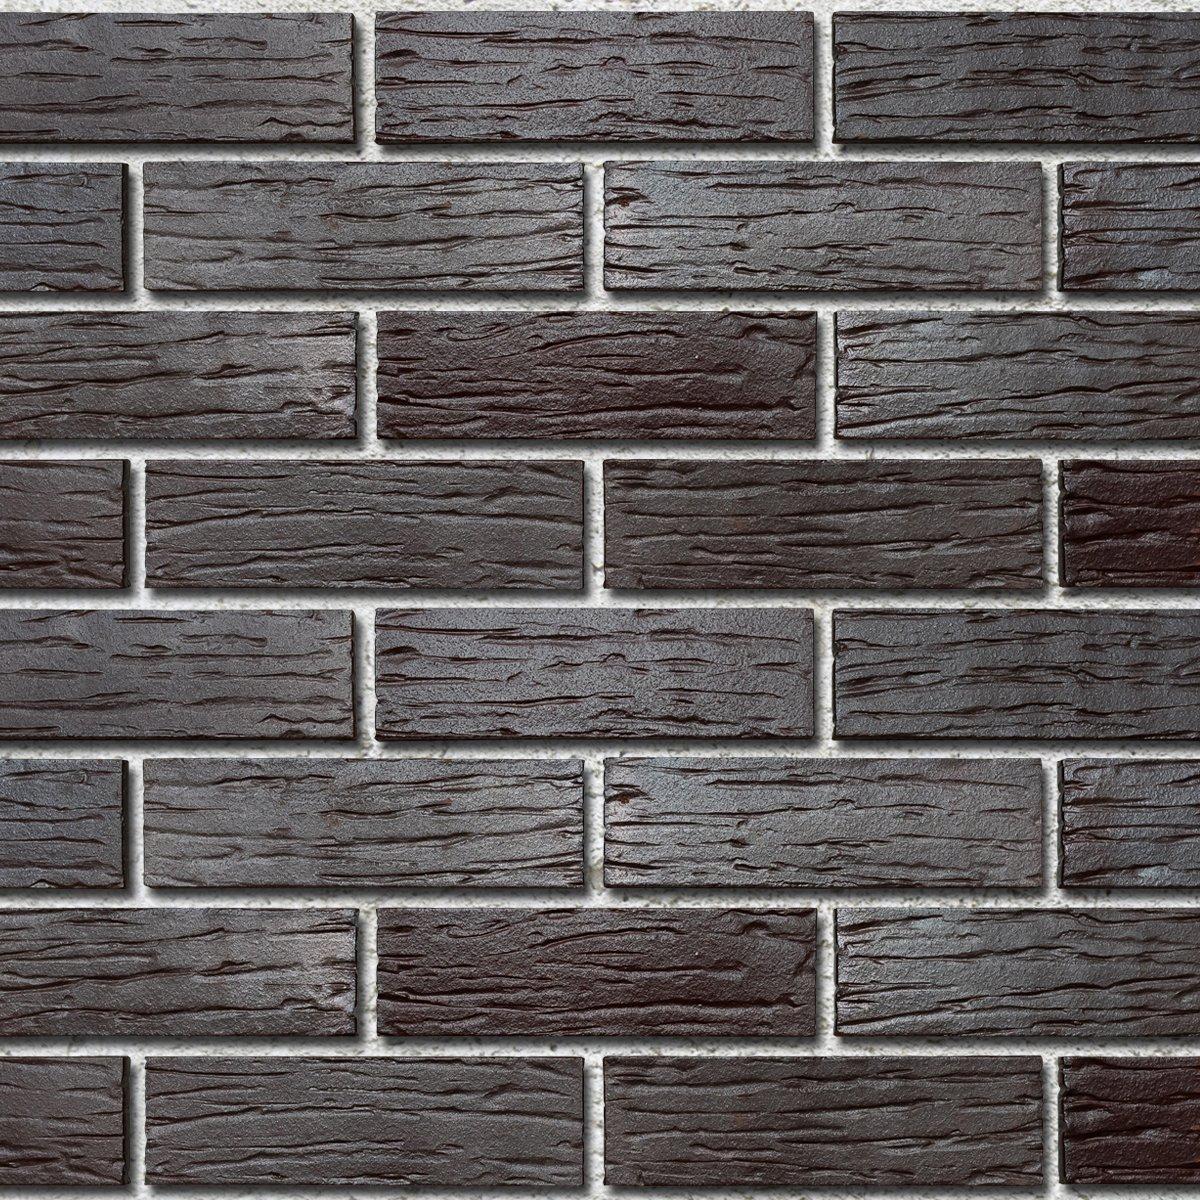 ADELAIDE burgund genarbt, клинкерная плитка